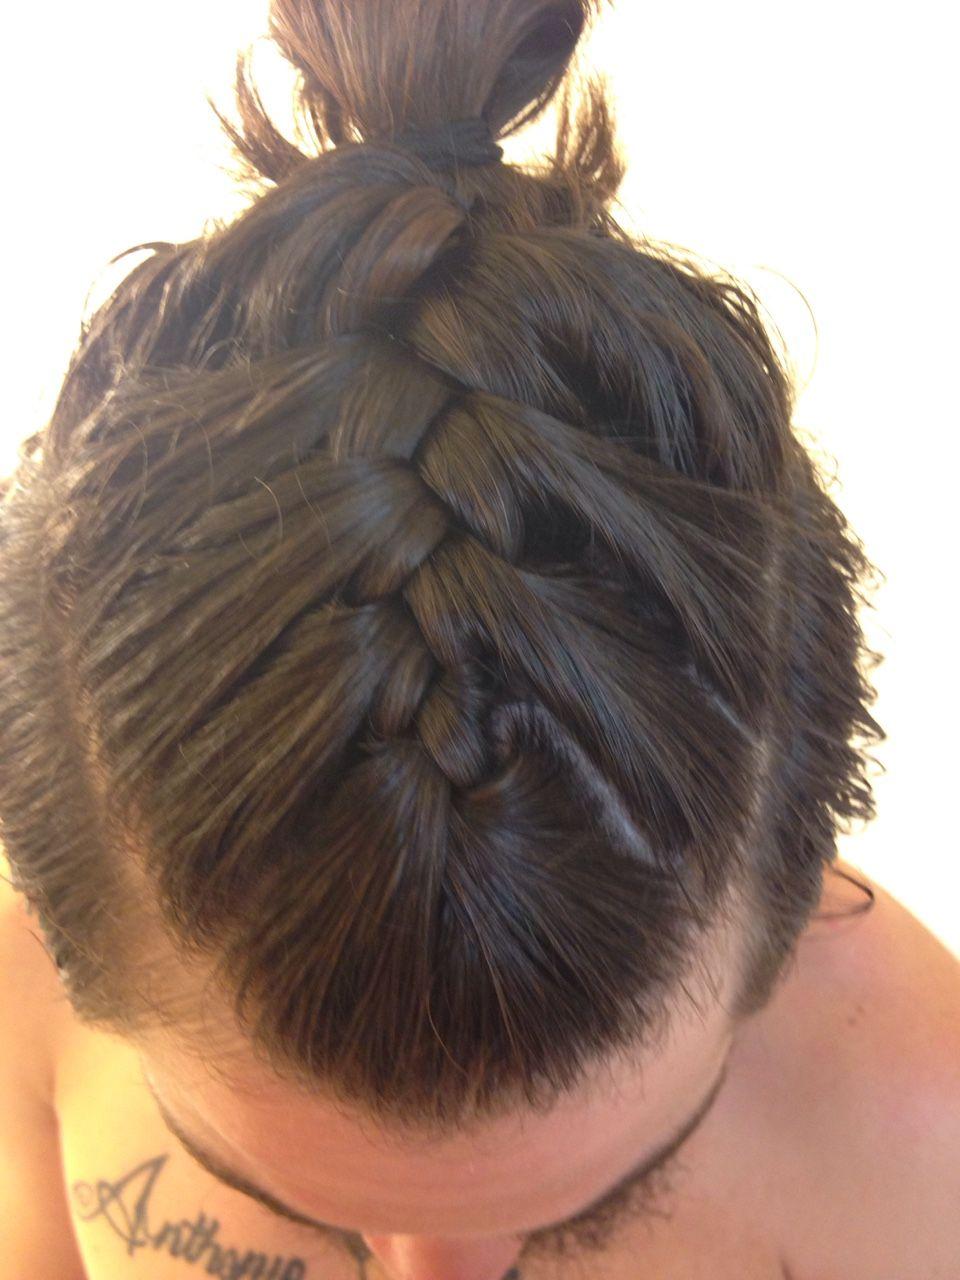 Manbraid tumblr メンズヘアスタイル pinterest hair style